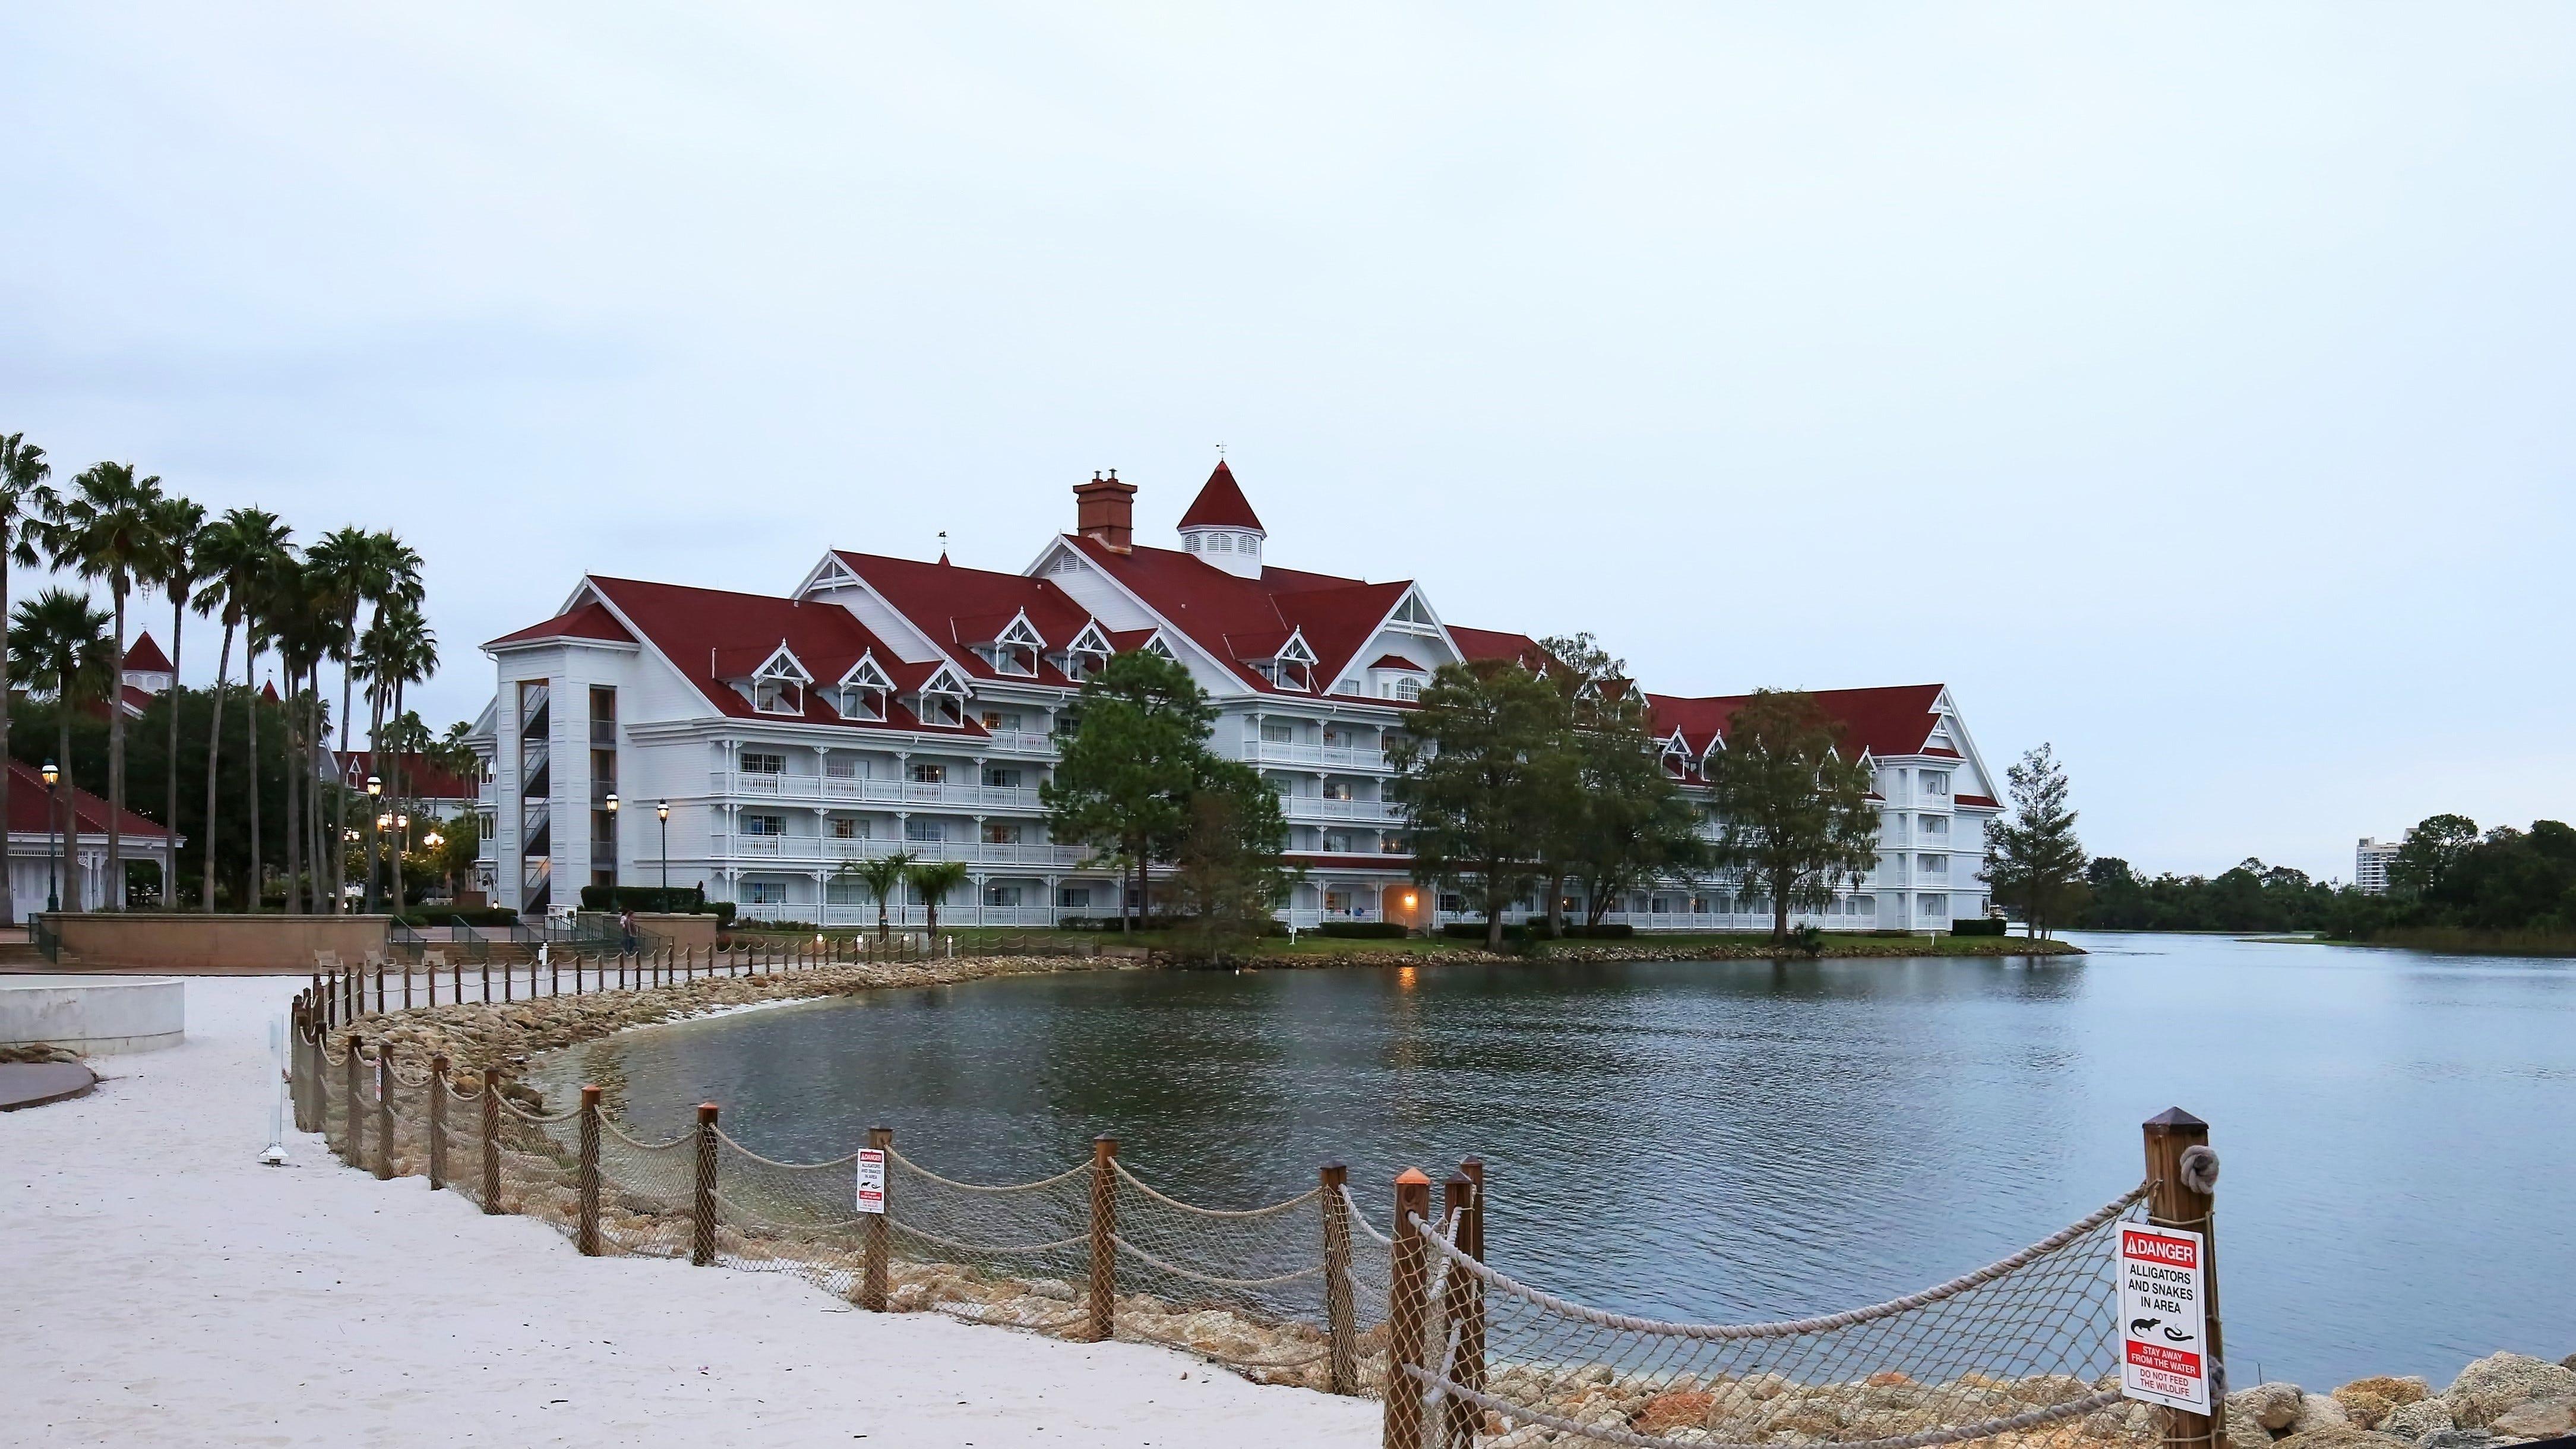 Disney World's Grand Floridian Resort & Spa.